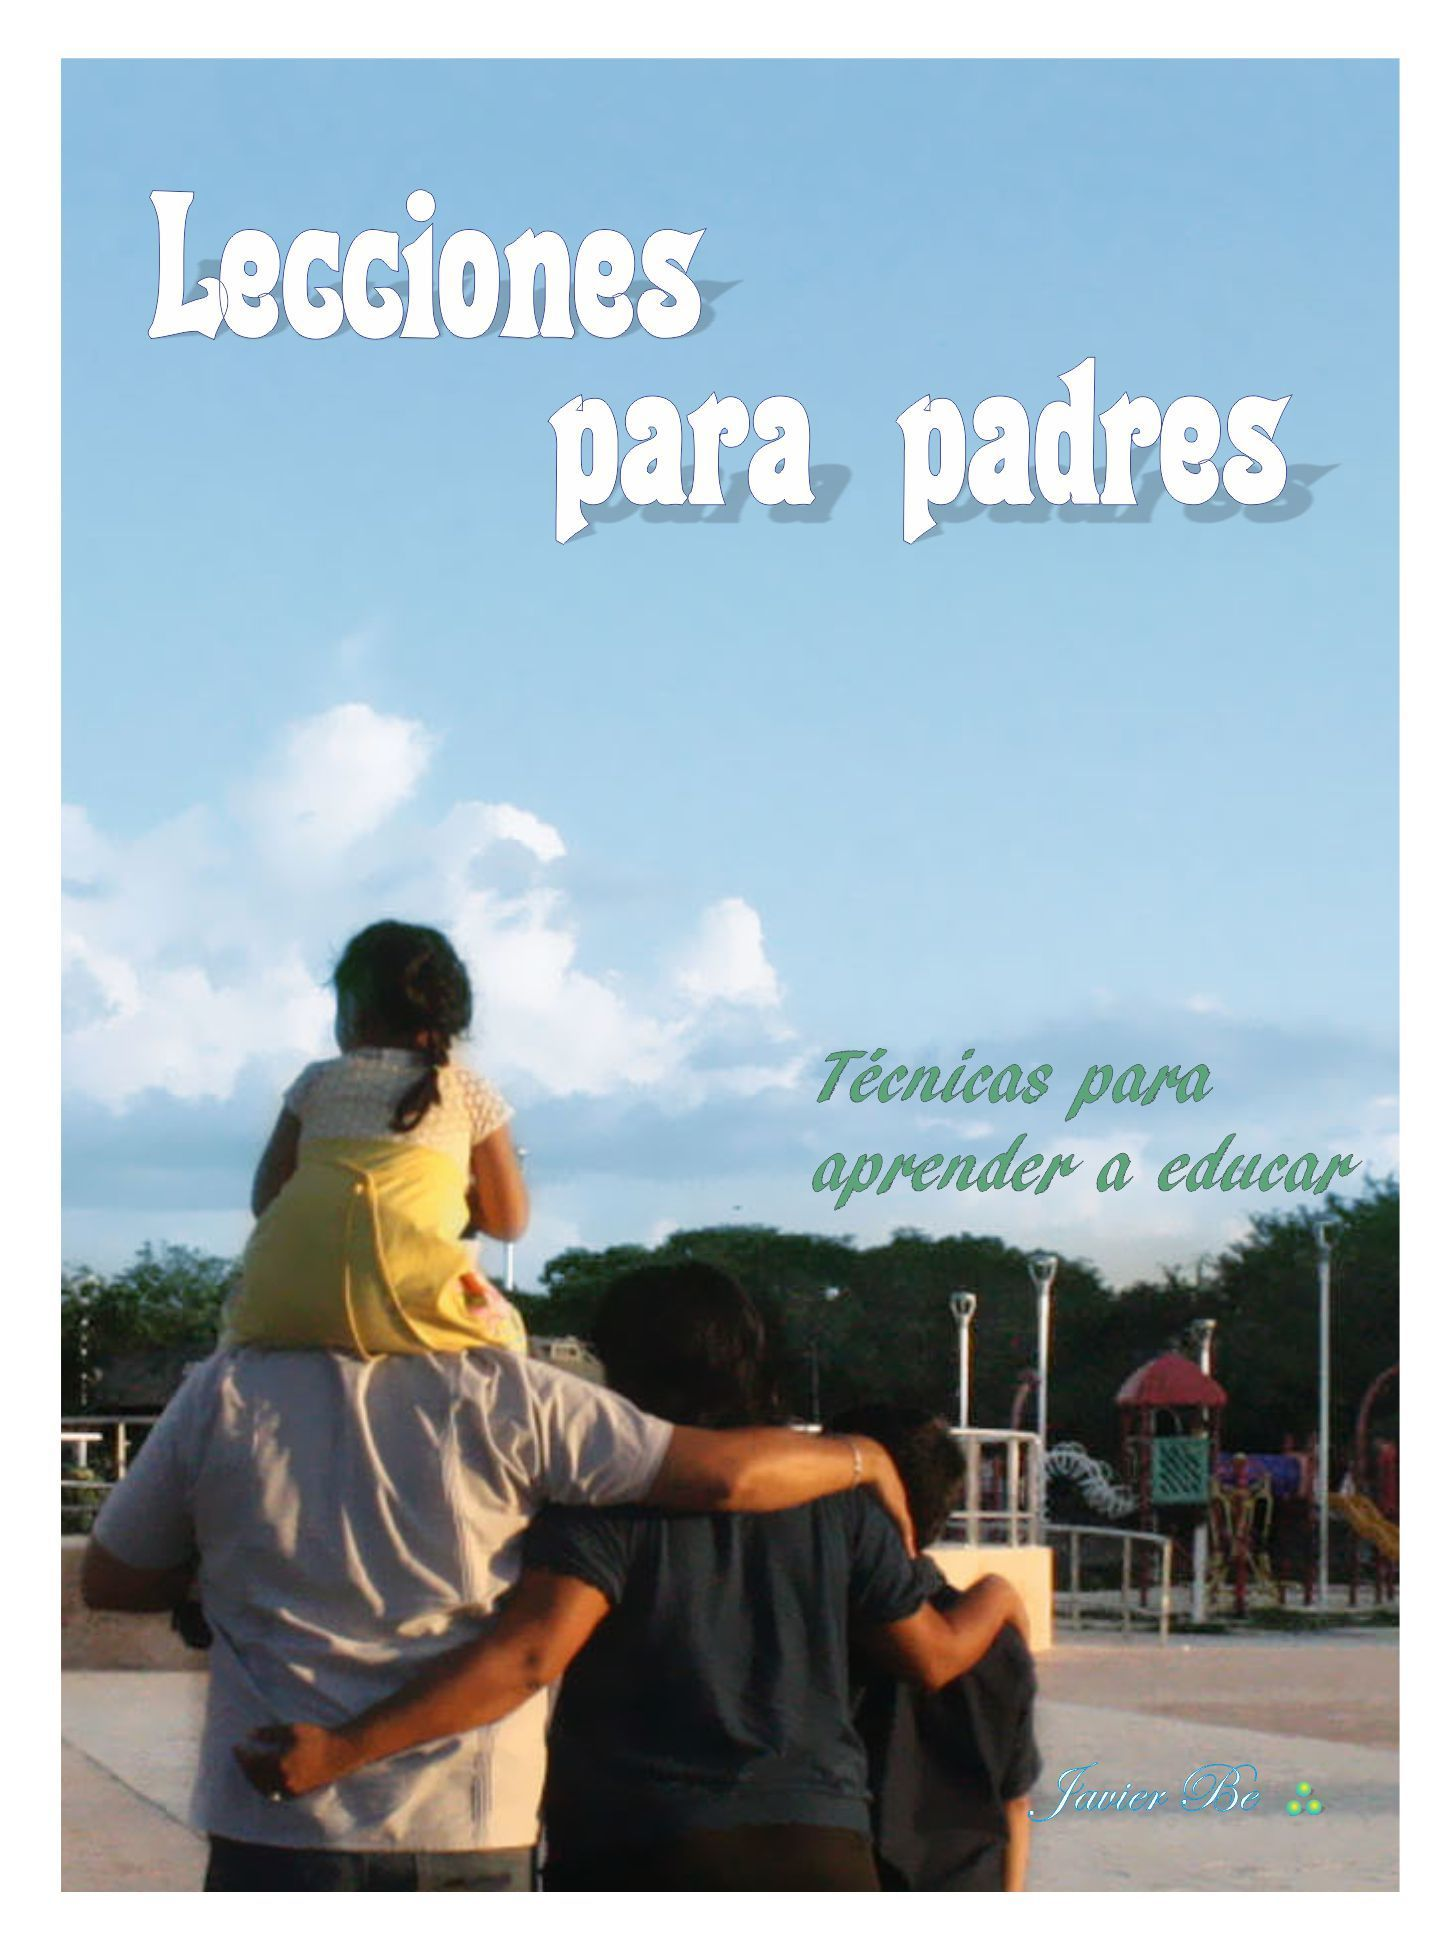 Lecciones para padres  by  Javier Be.:, Sr